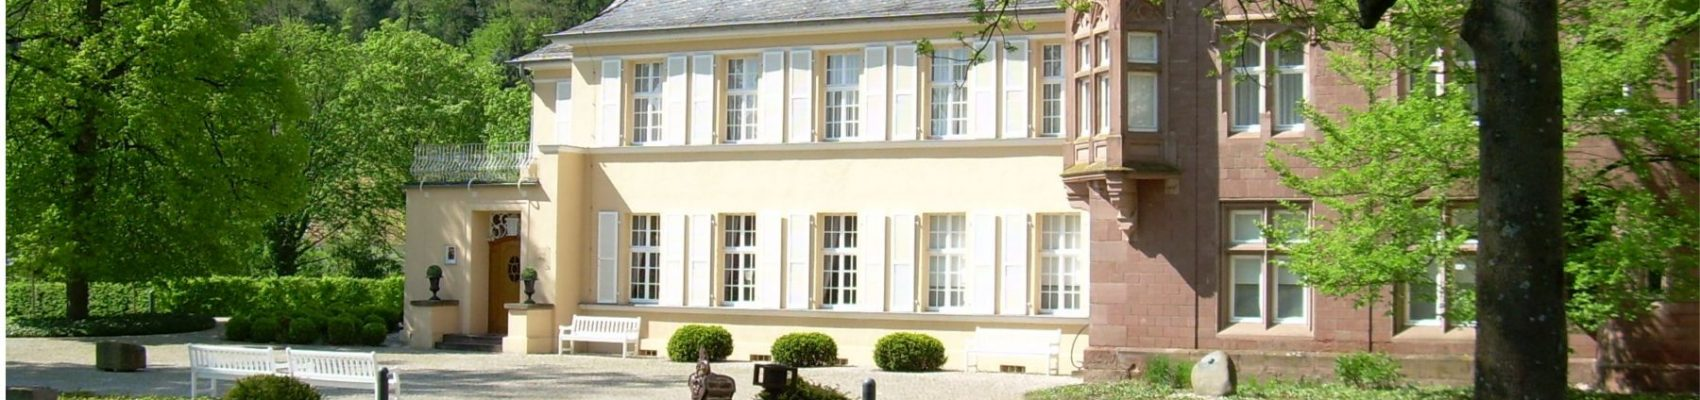 Sehenswürdigkeiten in Merzig: Museum Schloss Fellenberg – Musée du Château Fellenberg